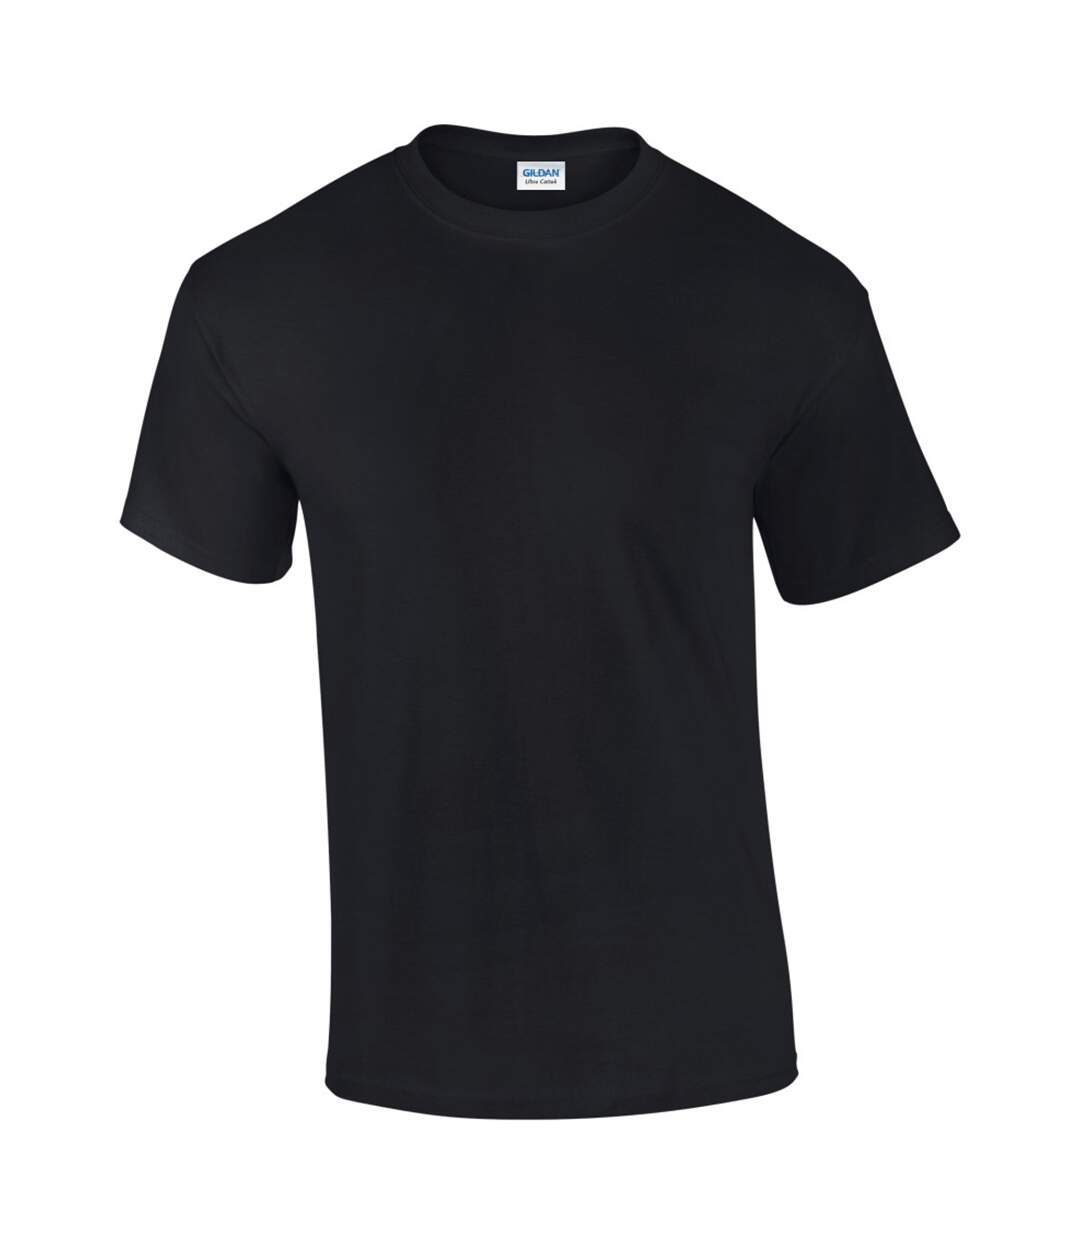 Gildan Mens Ultra Cotton Short Sleeve T-Shirt (Red) - UTBC475